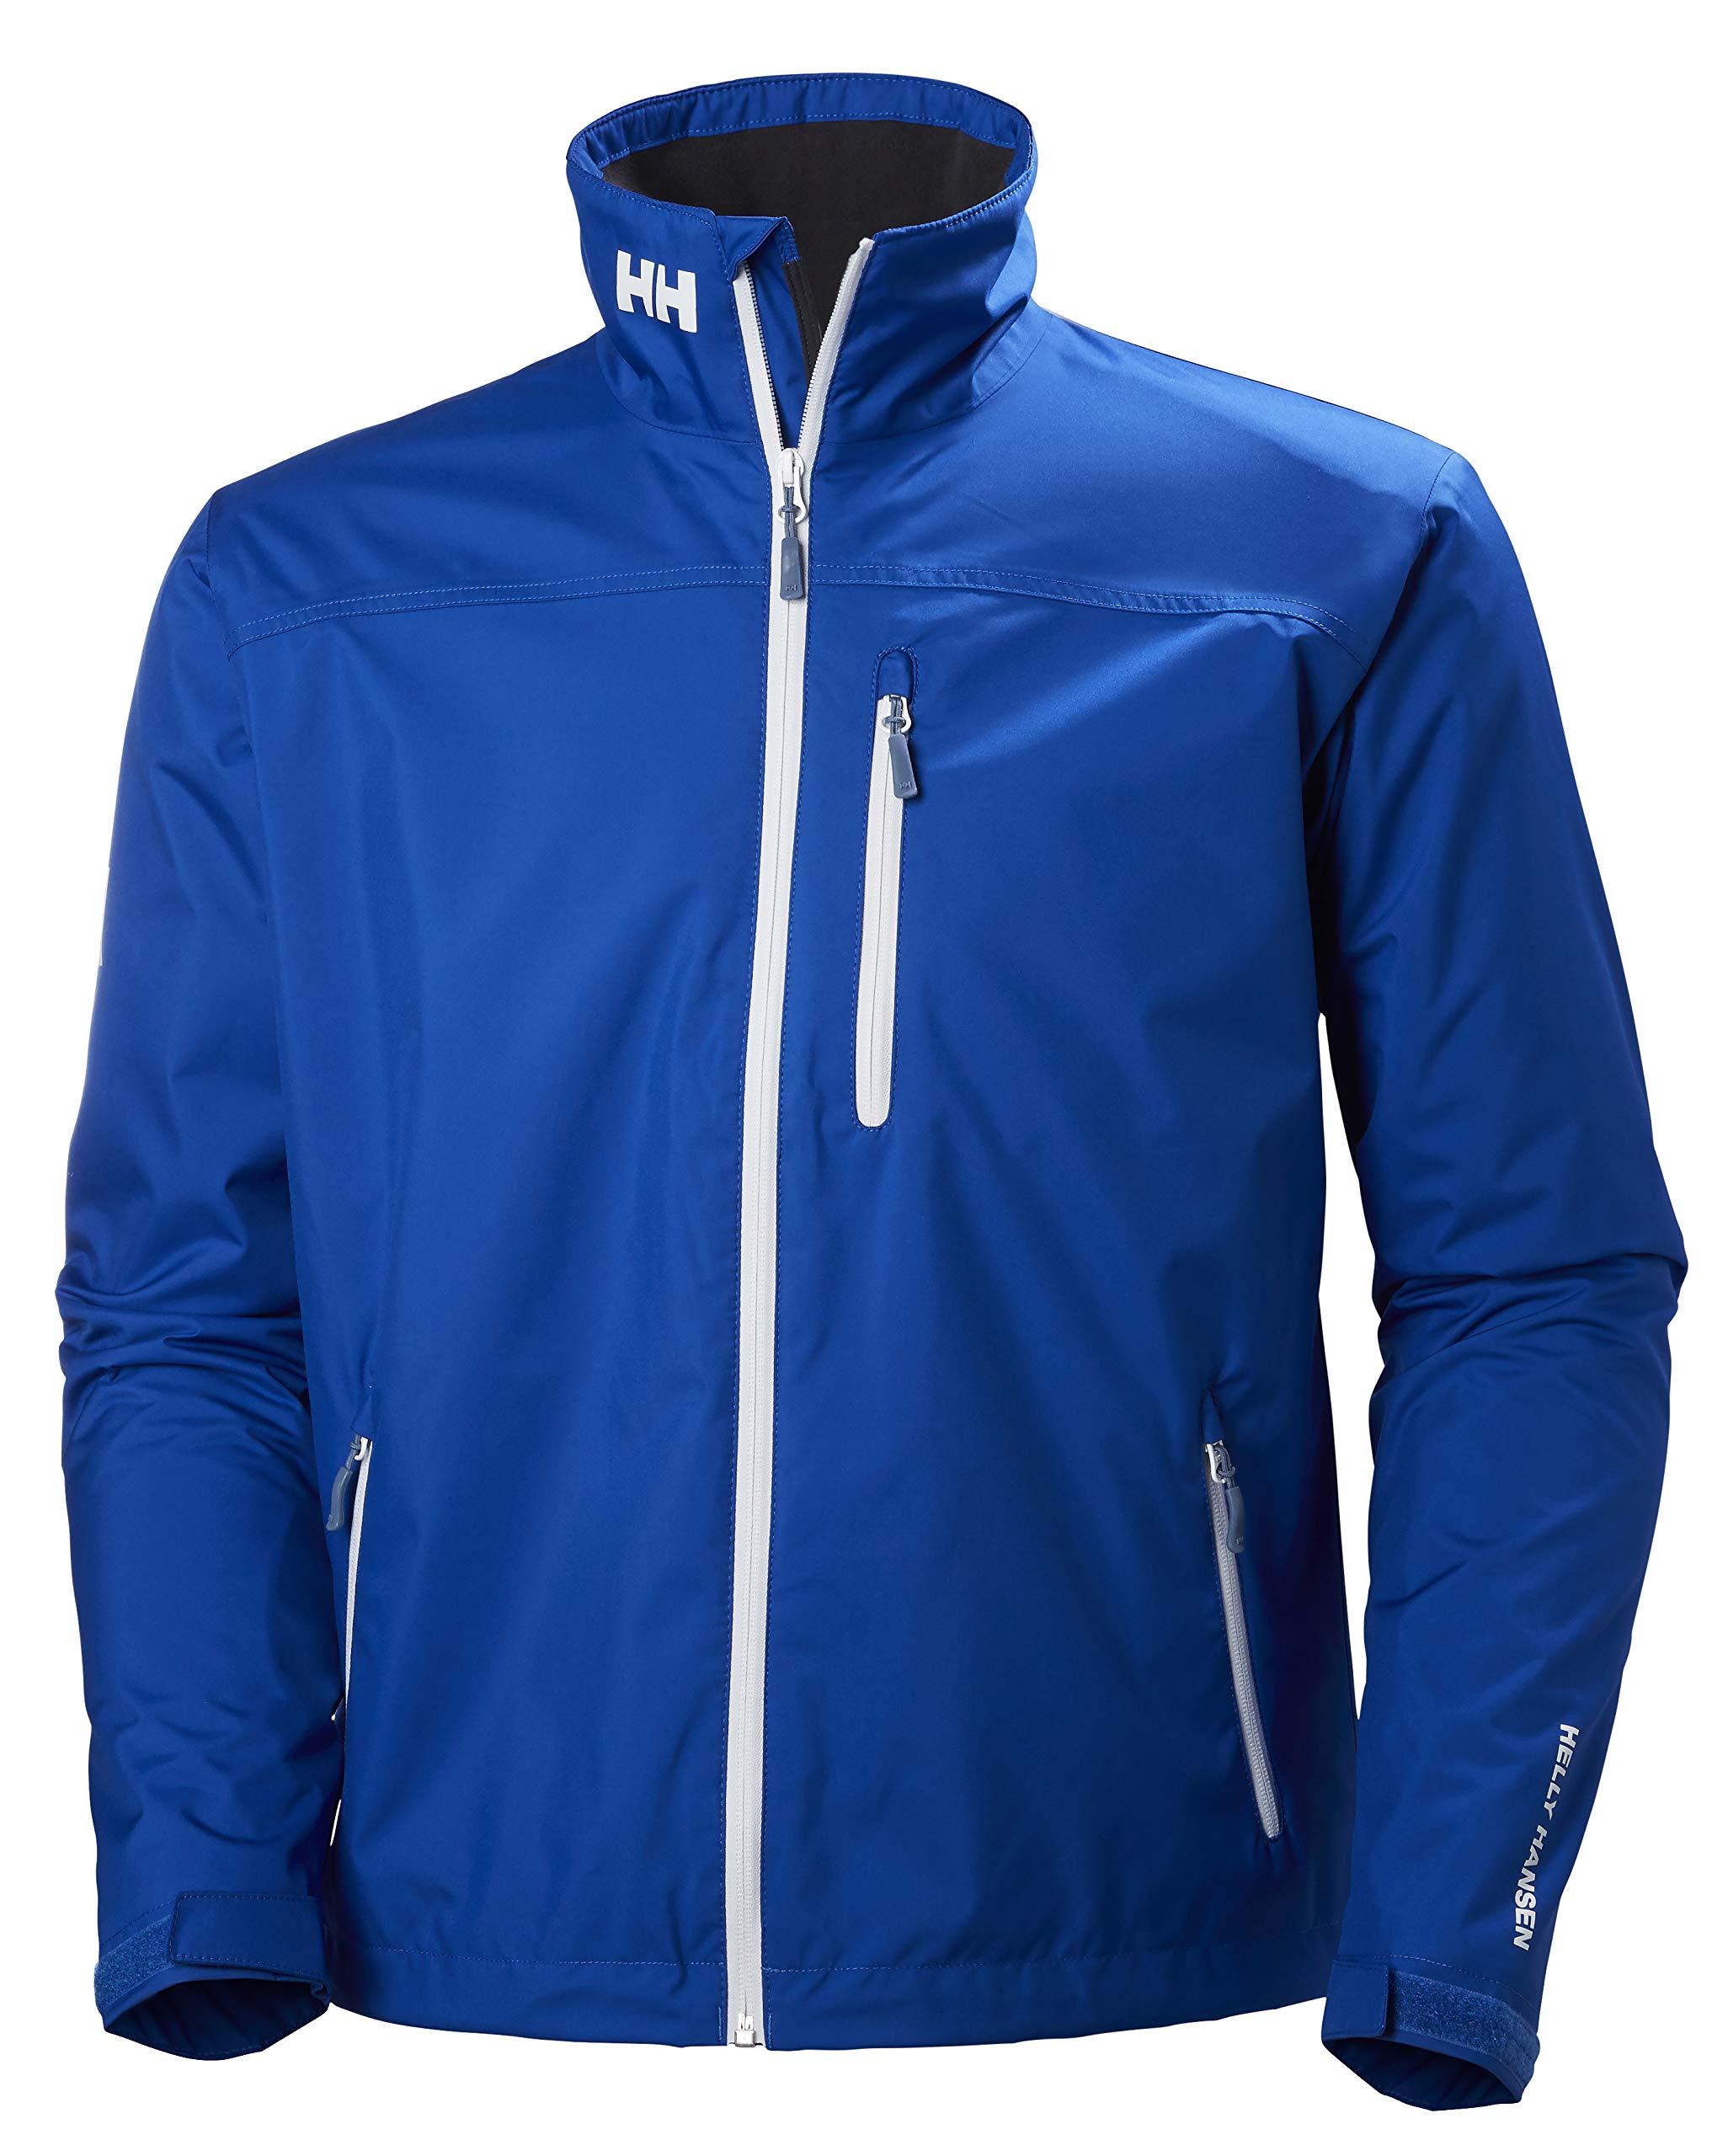 Helly Hansen Men's Crew Midlayer Fleece Lined Waterproof Windproof Breathable Rain Coat Jacket, 563 Olympian Blue, Small by Helly Hansen